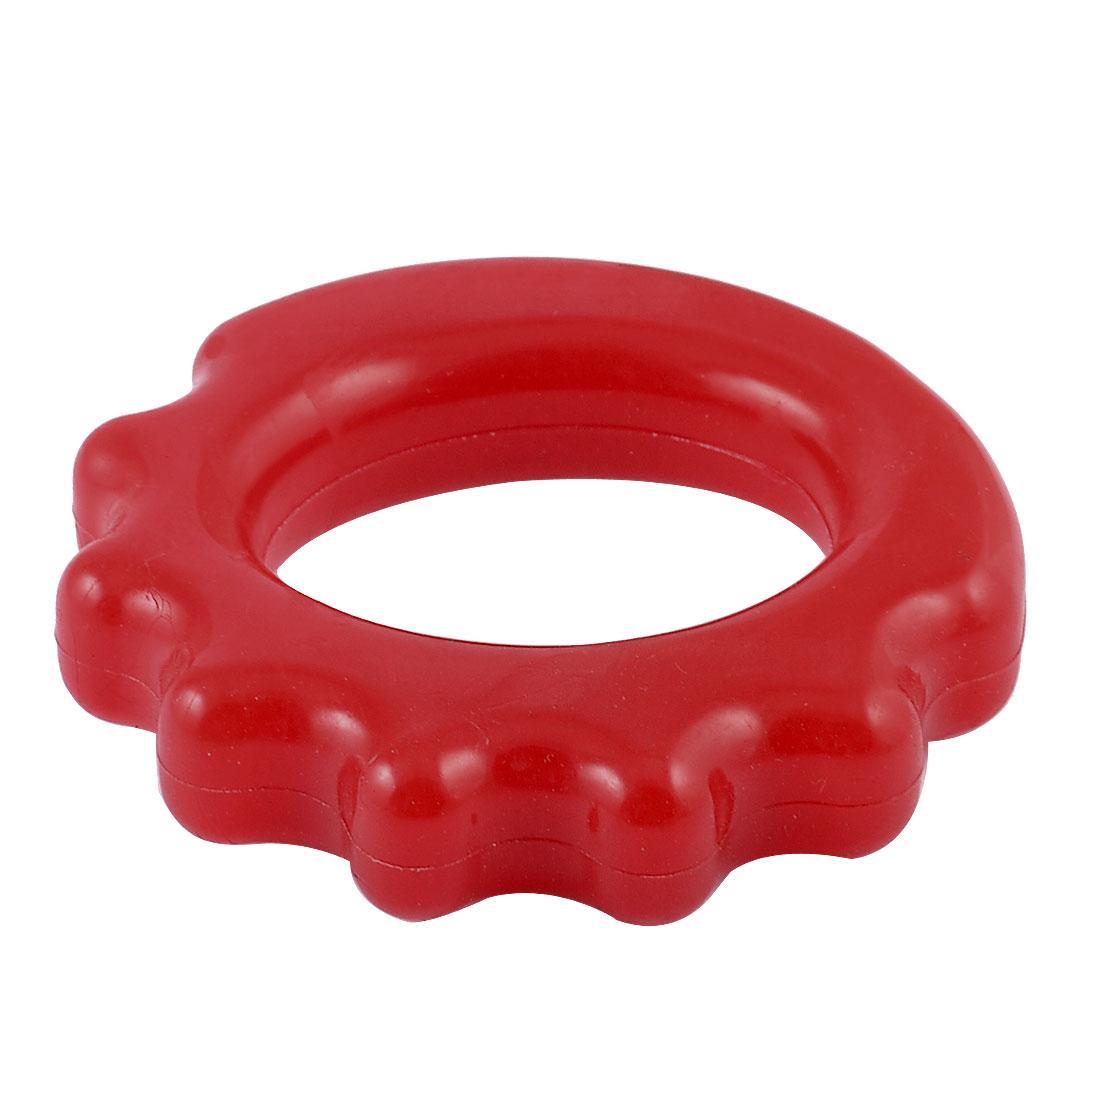 Training Red Soft Plastic Elastic Hand Finger Strength Grip Ring